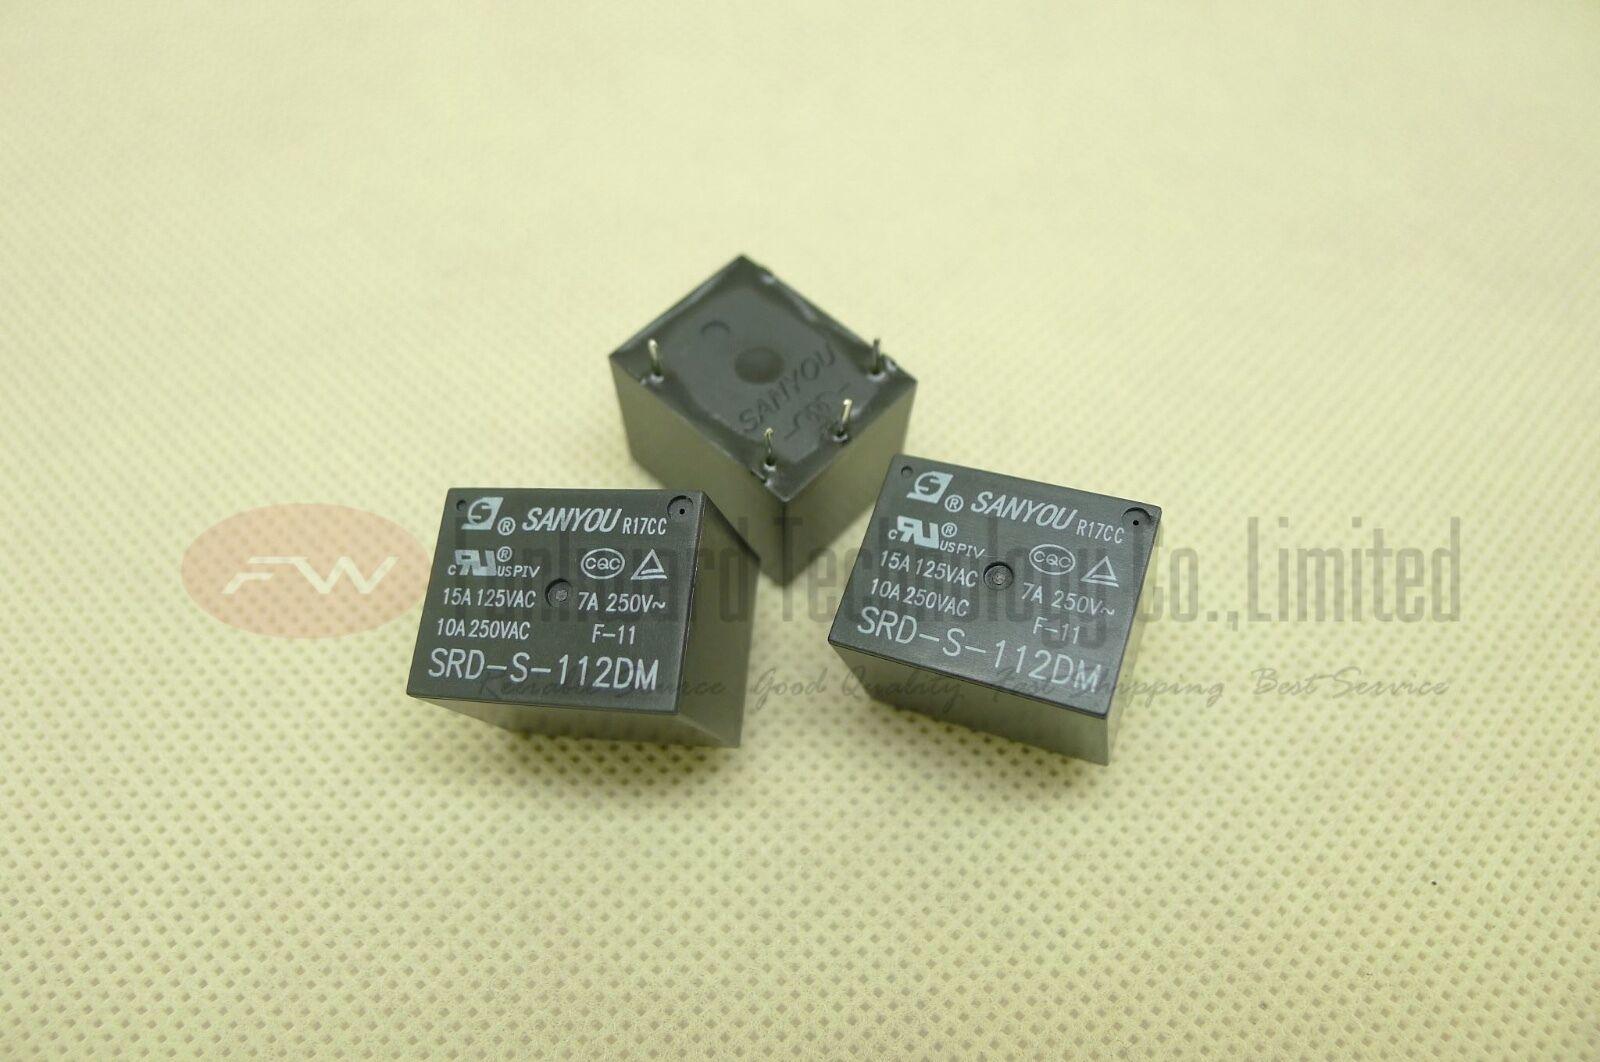 MVQNR2020K16 SV1604× 2+HL2414*2 MCS625 *2 VNMG1604×2 MCT513* 2